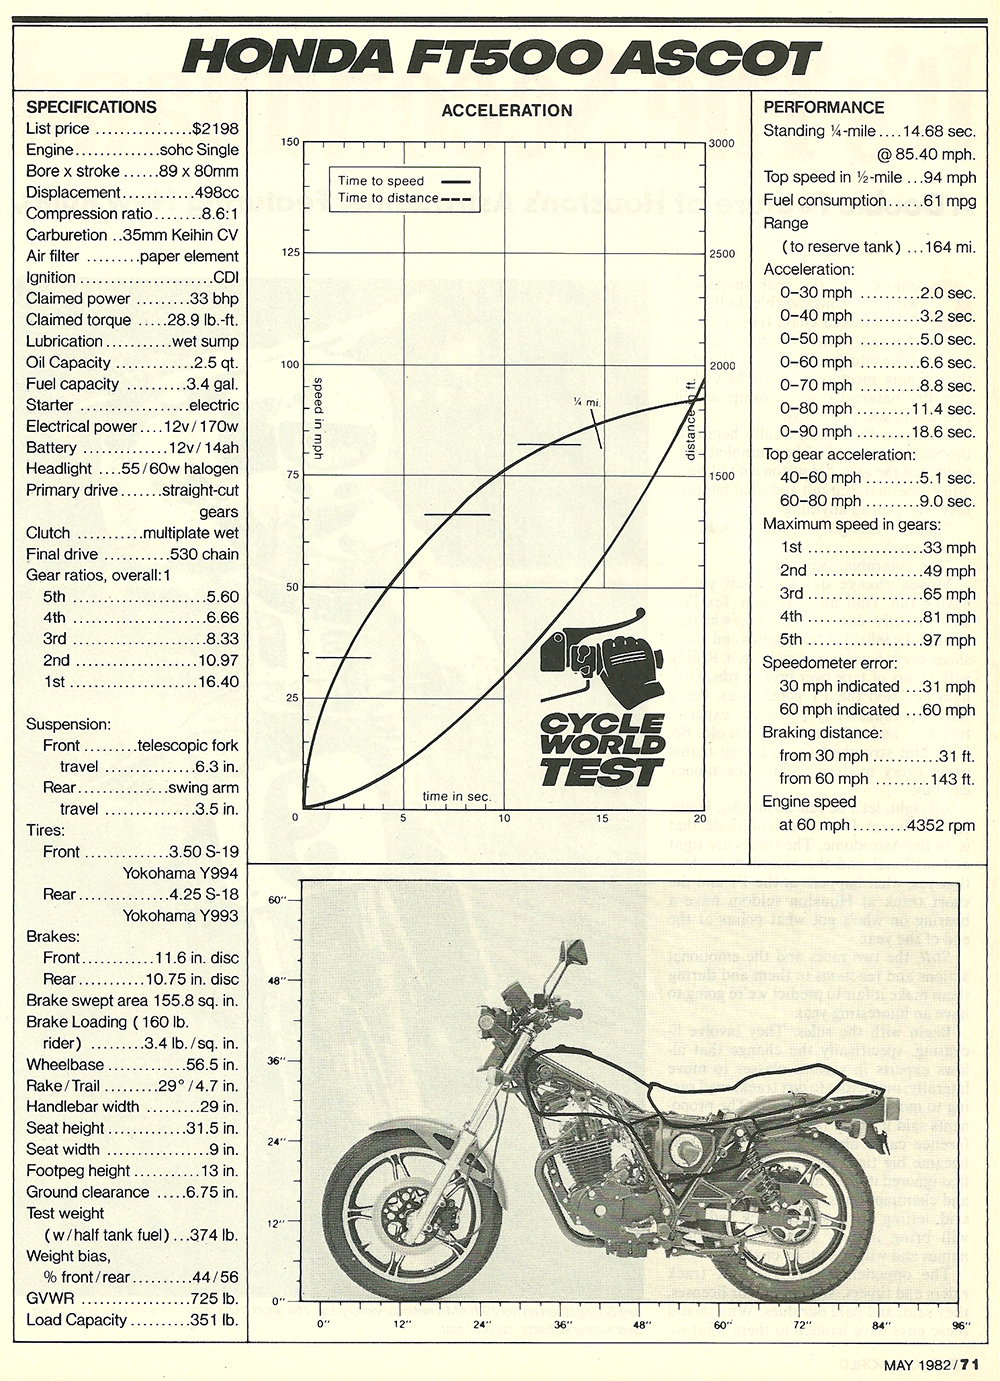 1982 Honda FT500 Ascot road test 08.jpg